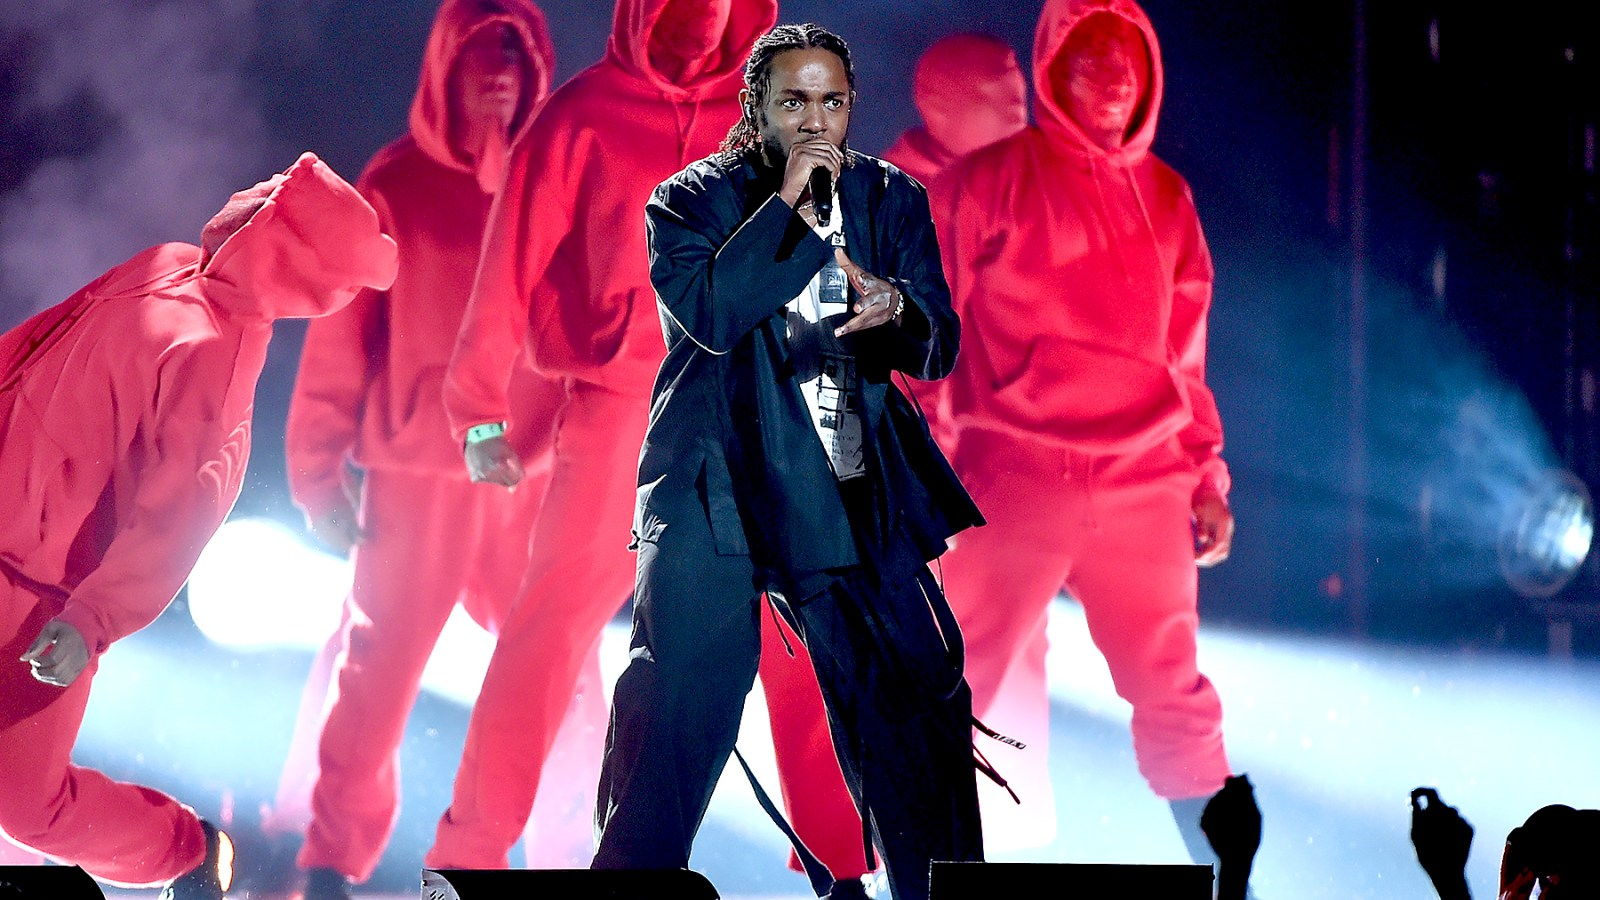 Ranking Inverso El Mejor Disco De Kendrick Lamar